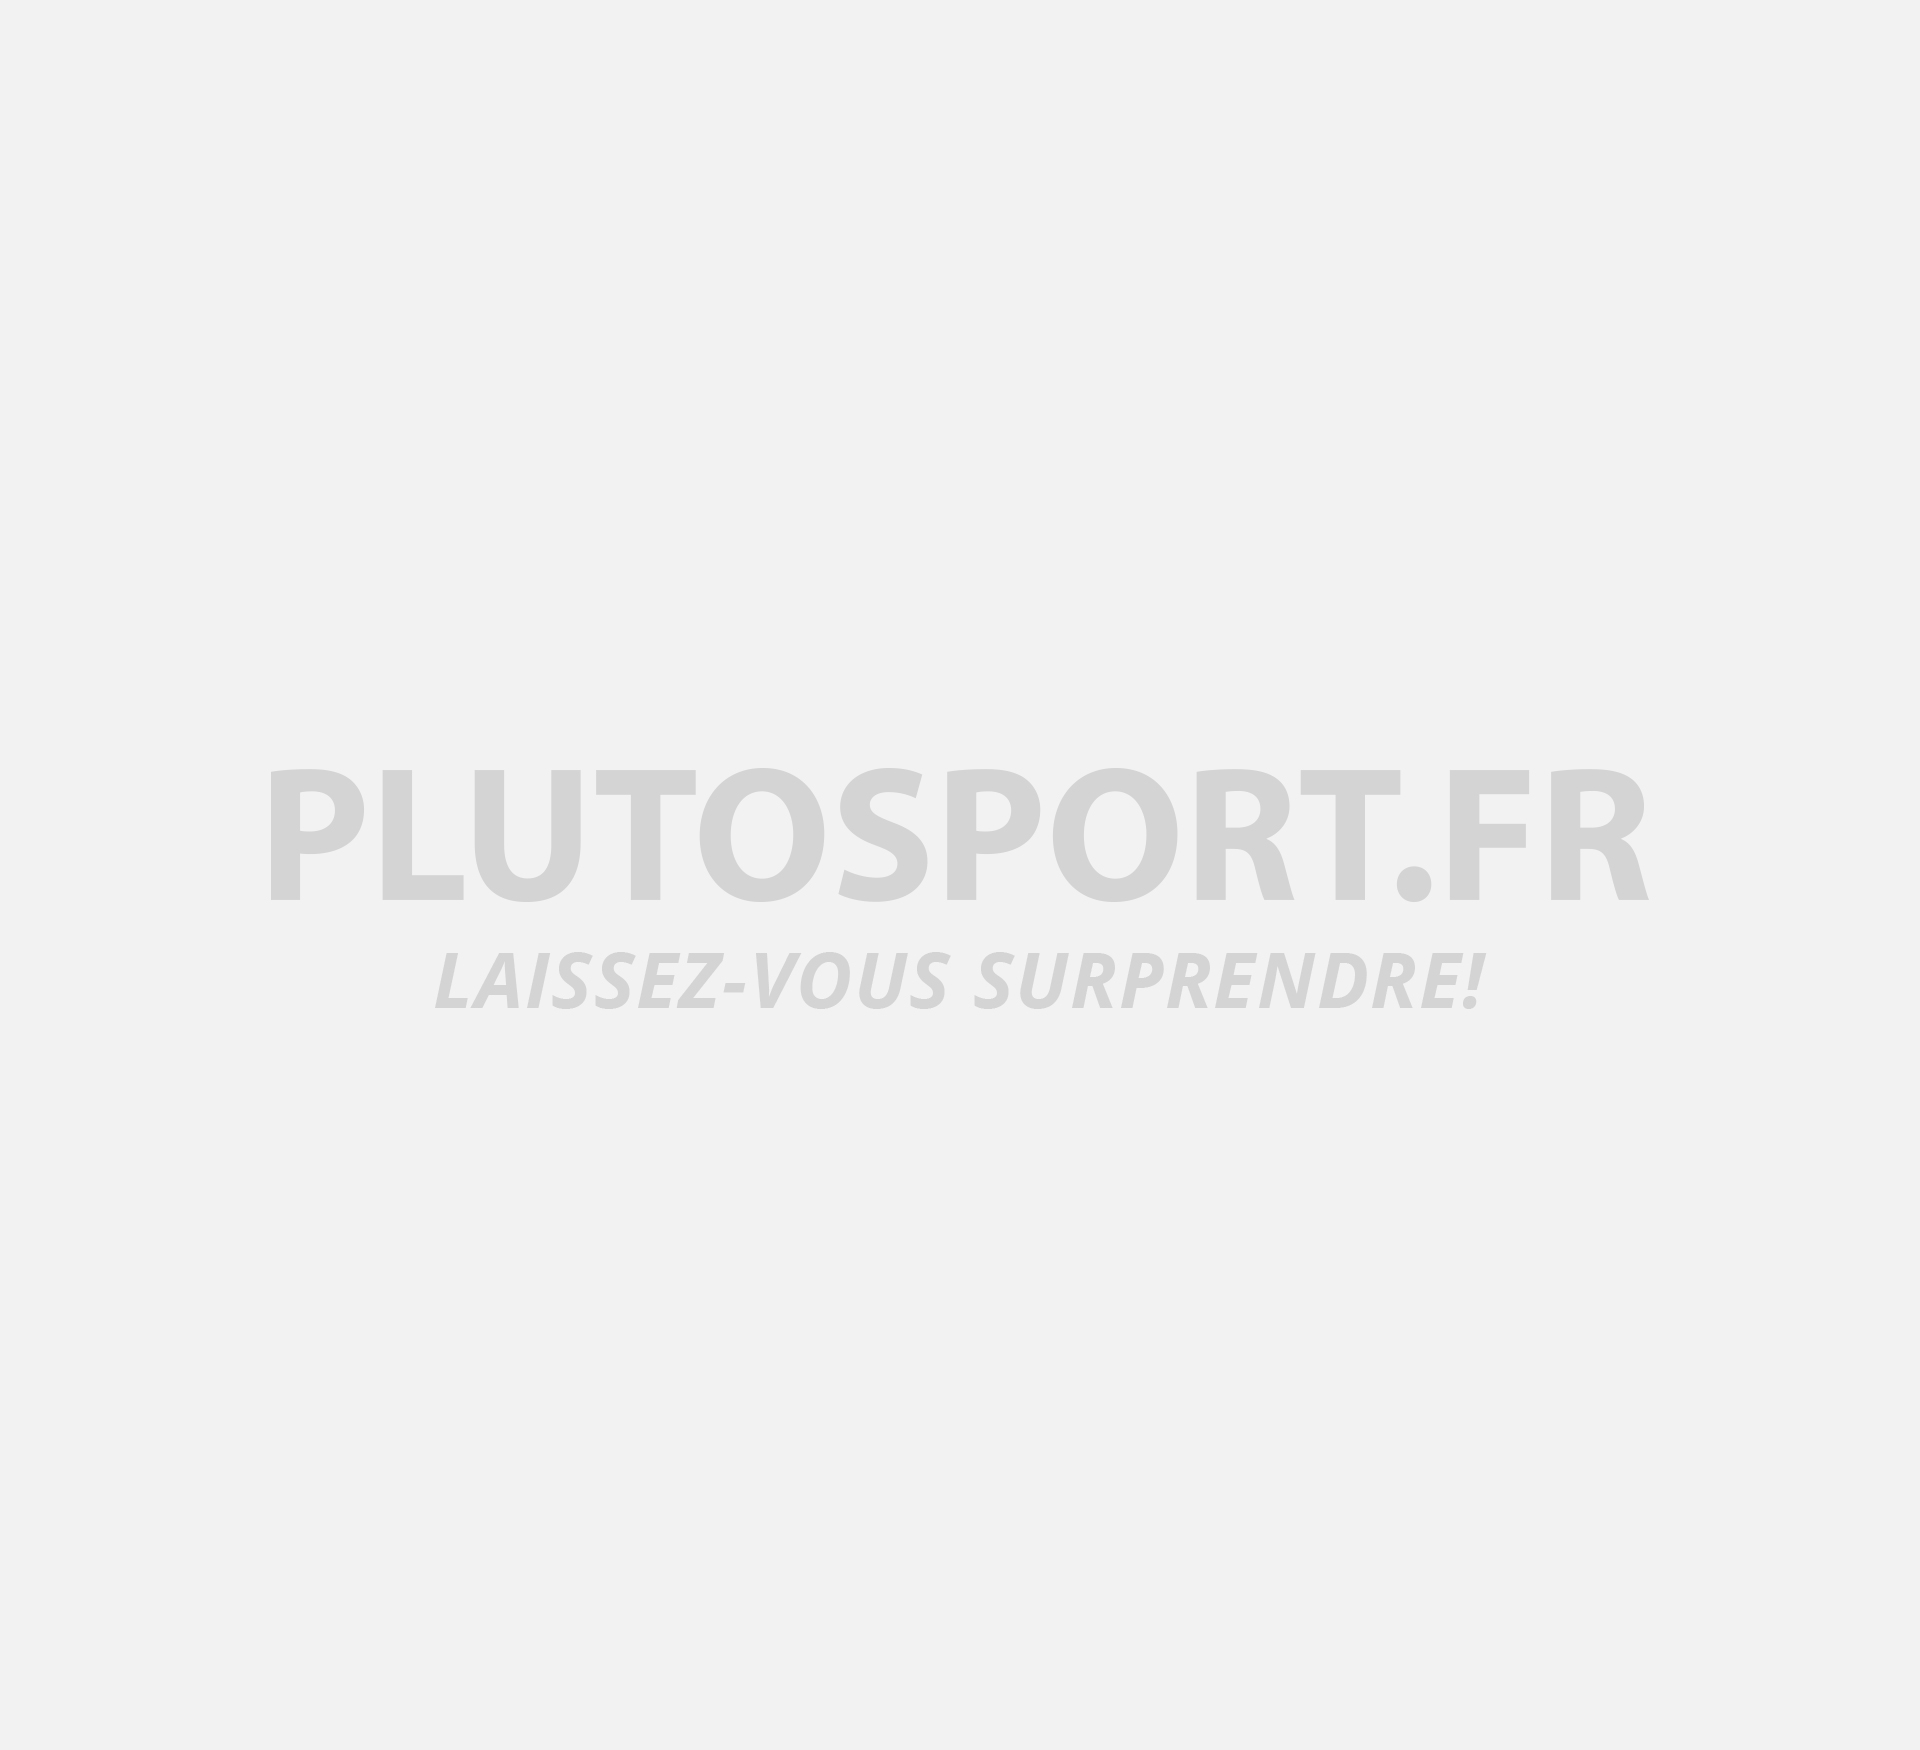 piel estrés delicadeza  Survêtement Nike CR7 Dri-Fit - Survêtements - Vêtements - Football - Sports    Plutosport